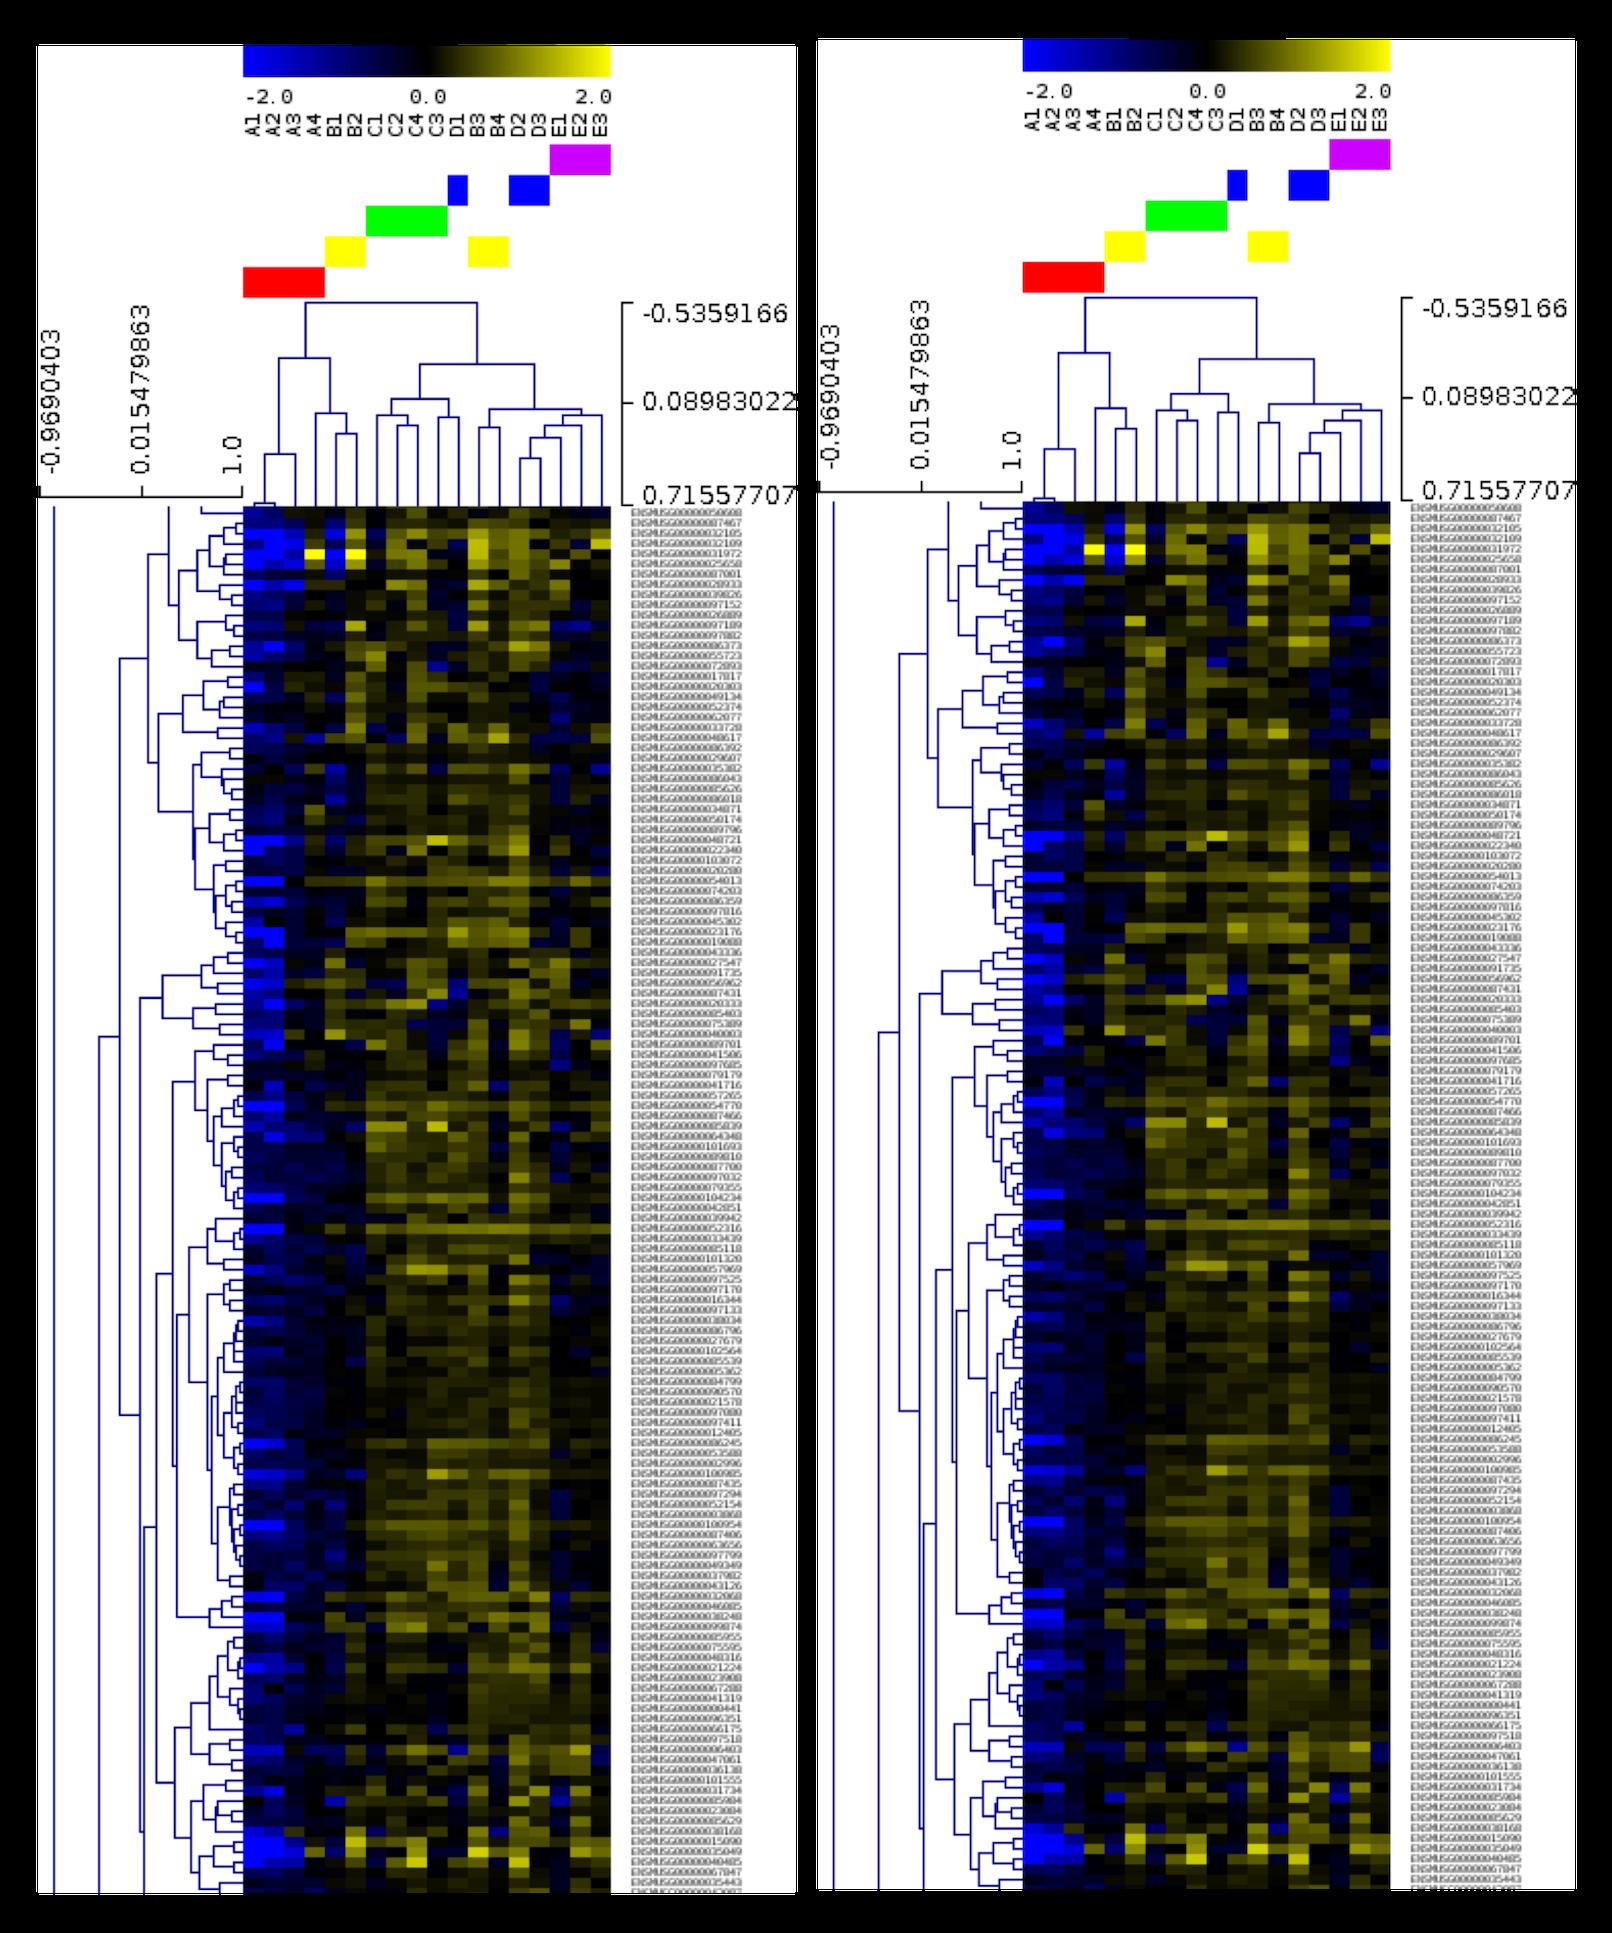 Heatmap generated from transcriptomic data from heart samples (Nathalia Tan)